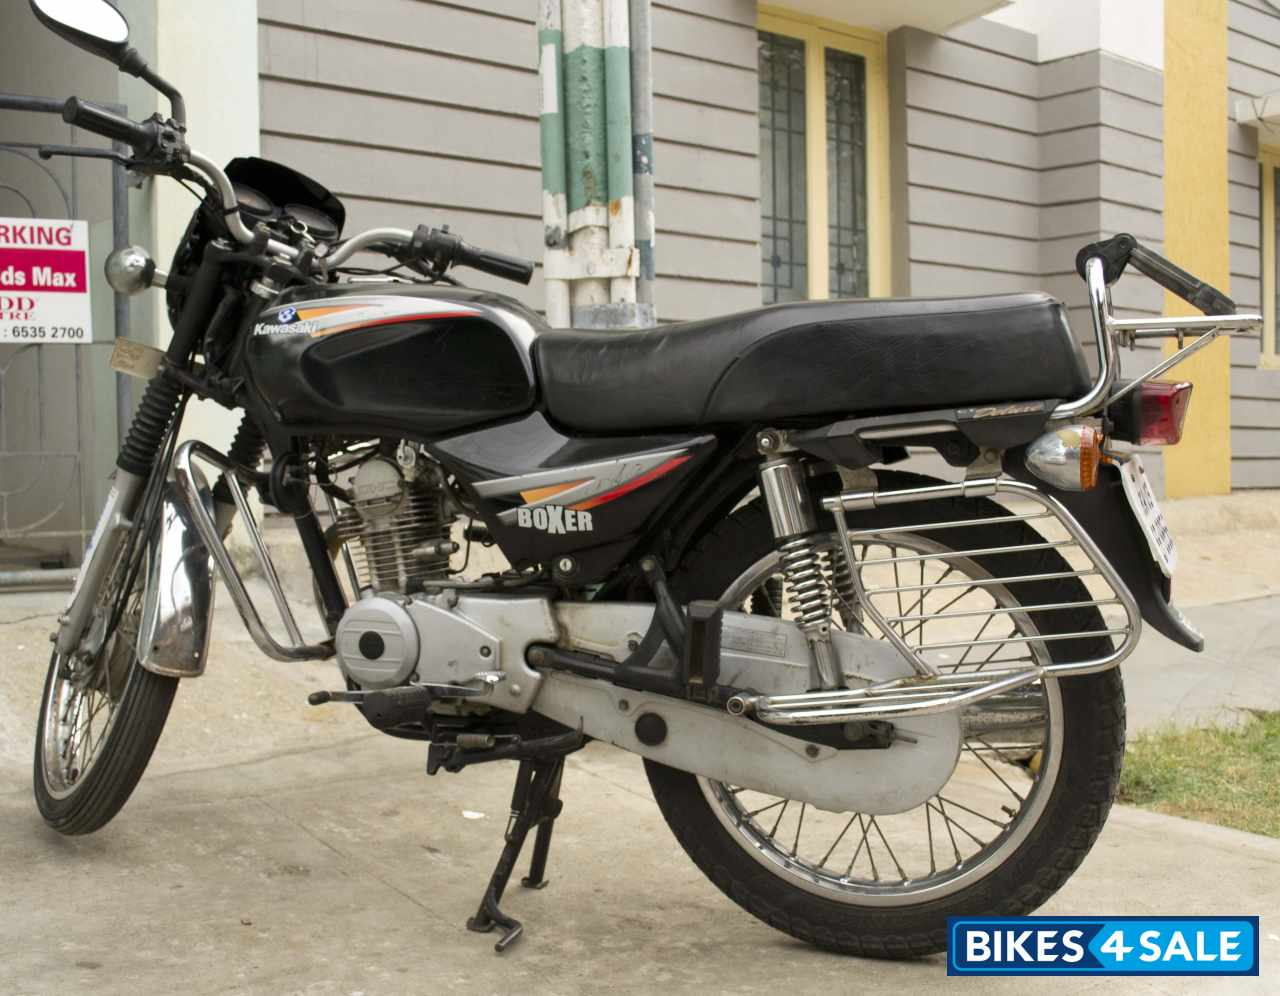 second hand bajaj boxer ct deluxe in bangalore bike is in. Black Bedroom Furniture Sets. Home Design Ideas